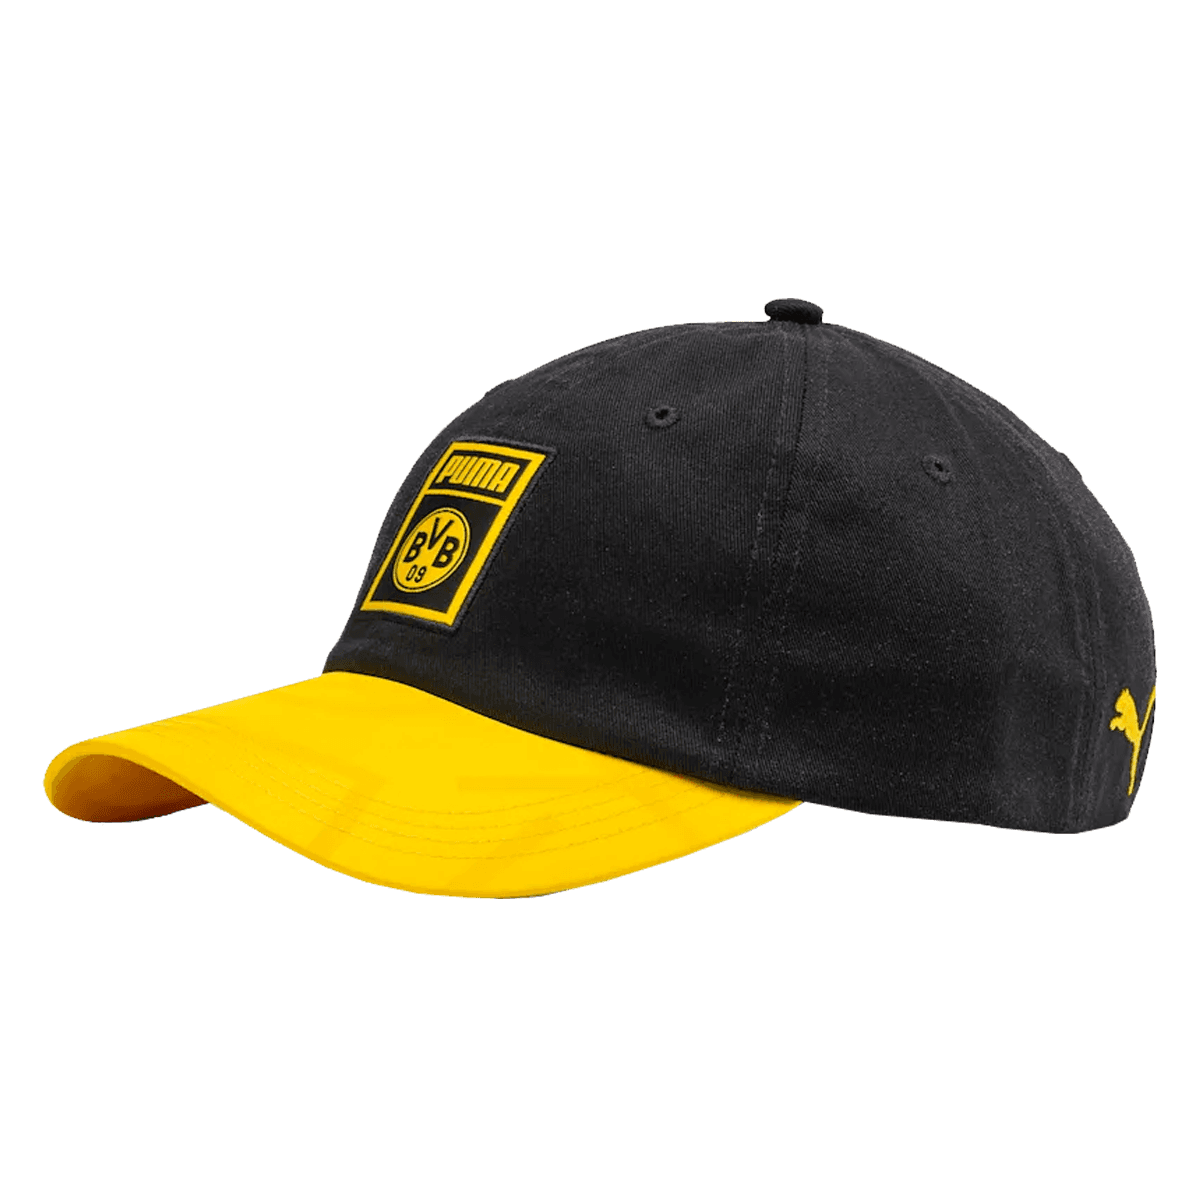 Puma BVB Kappe DNA Cap schwarzgelb